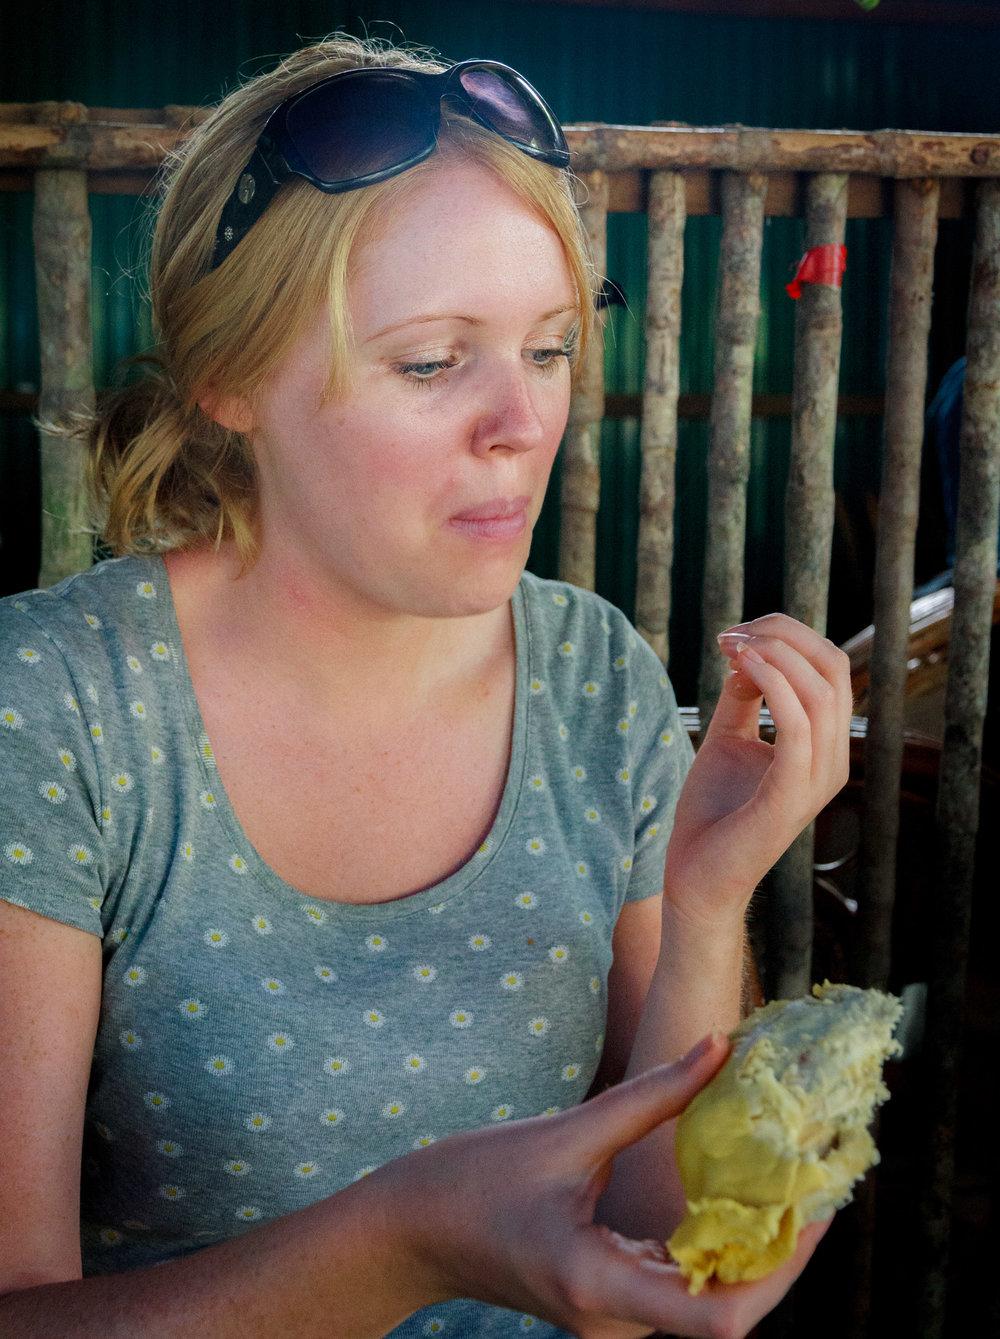 Tasting Durian